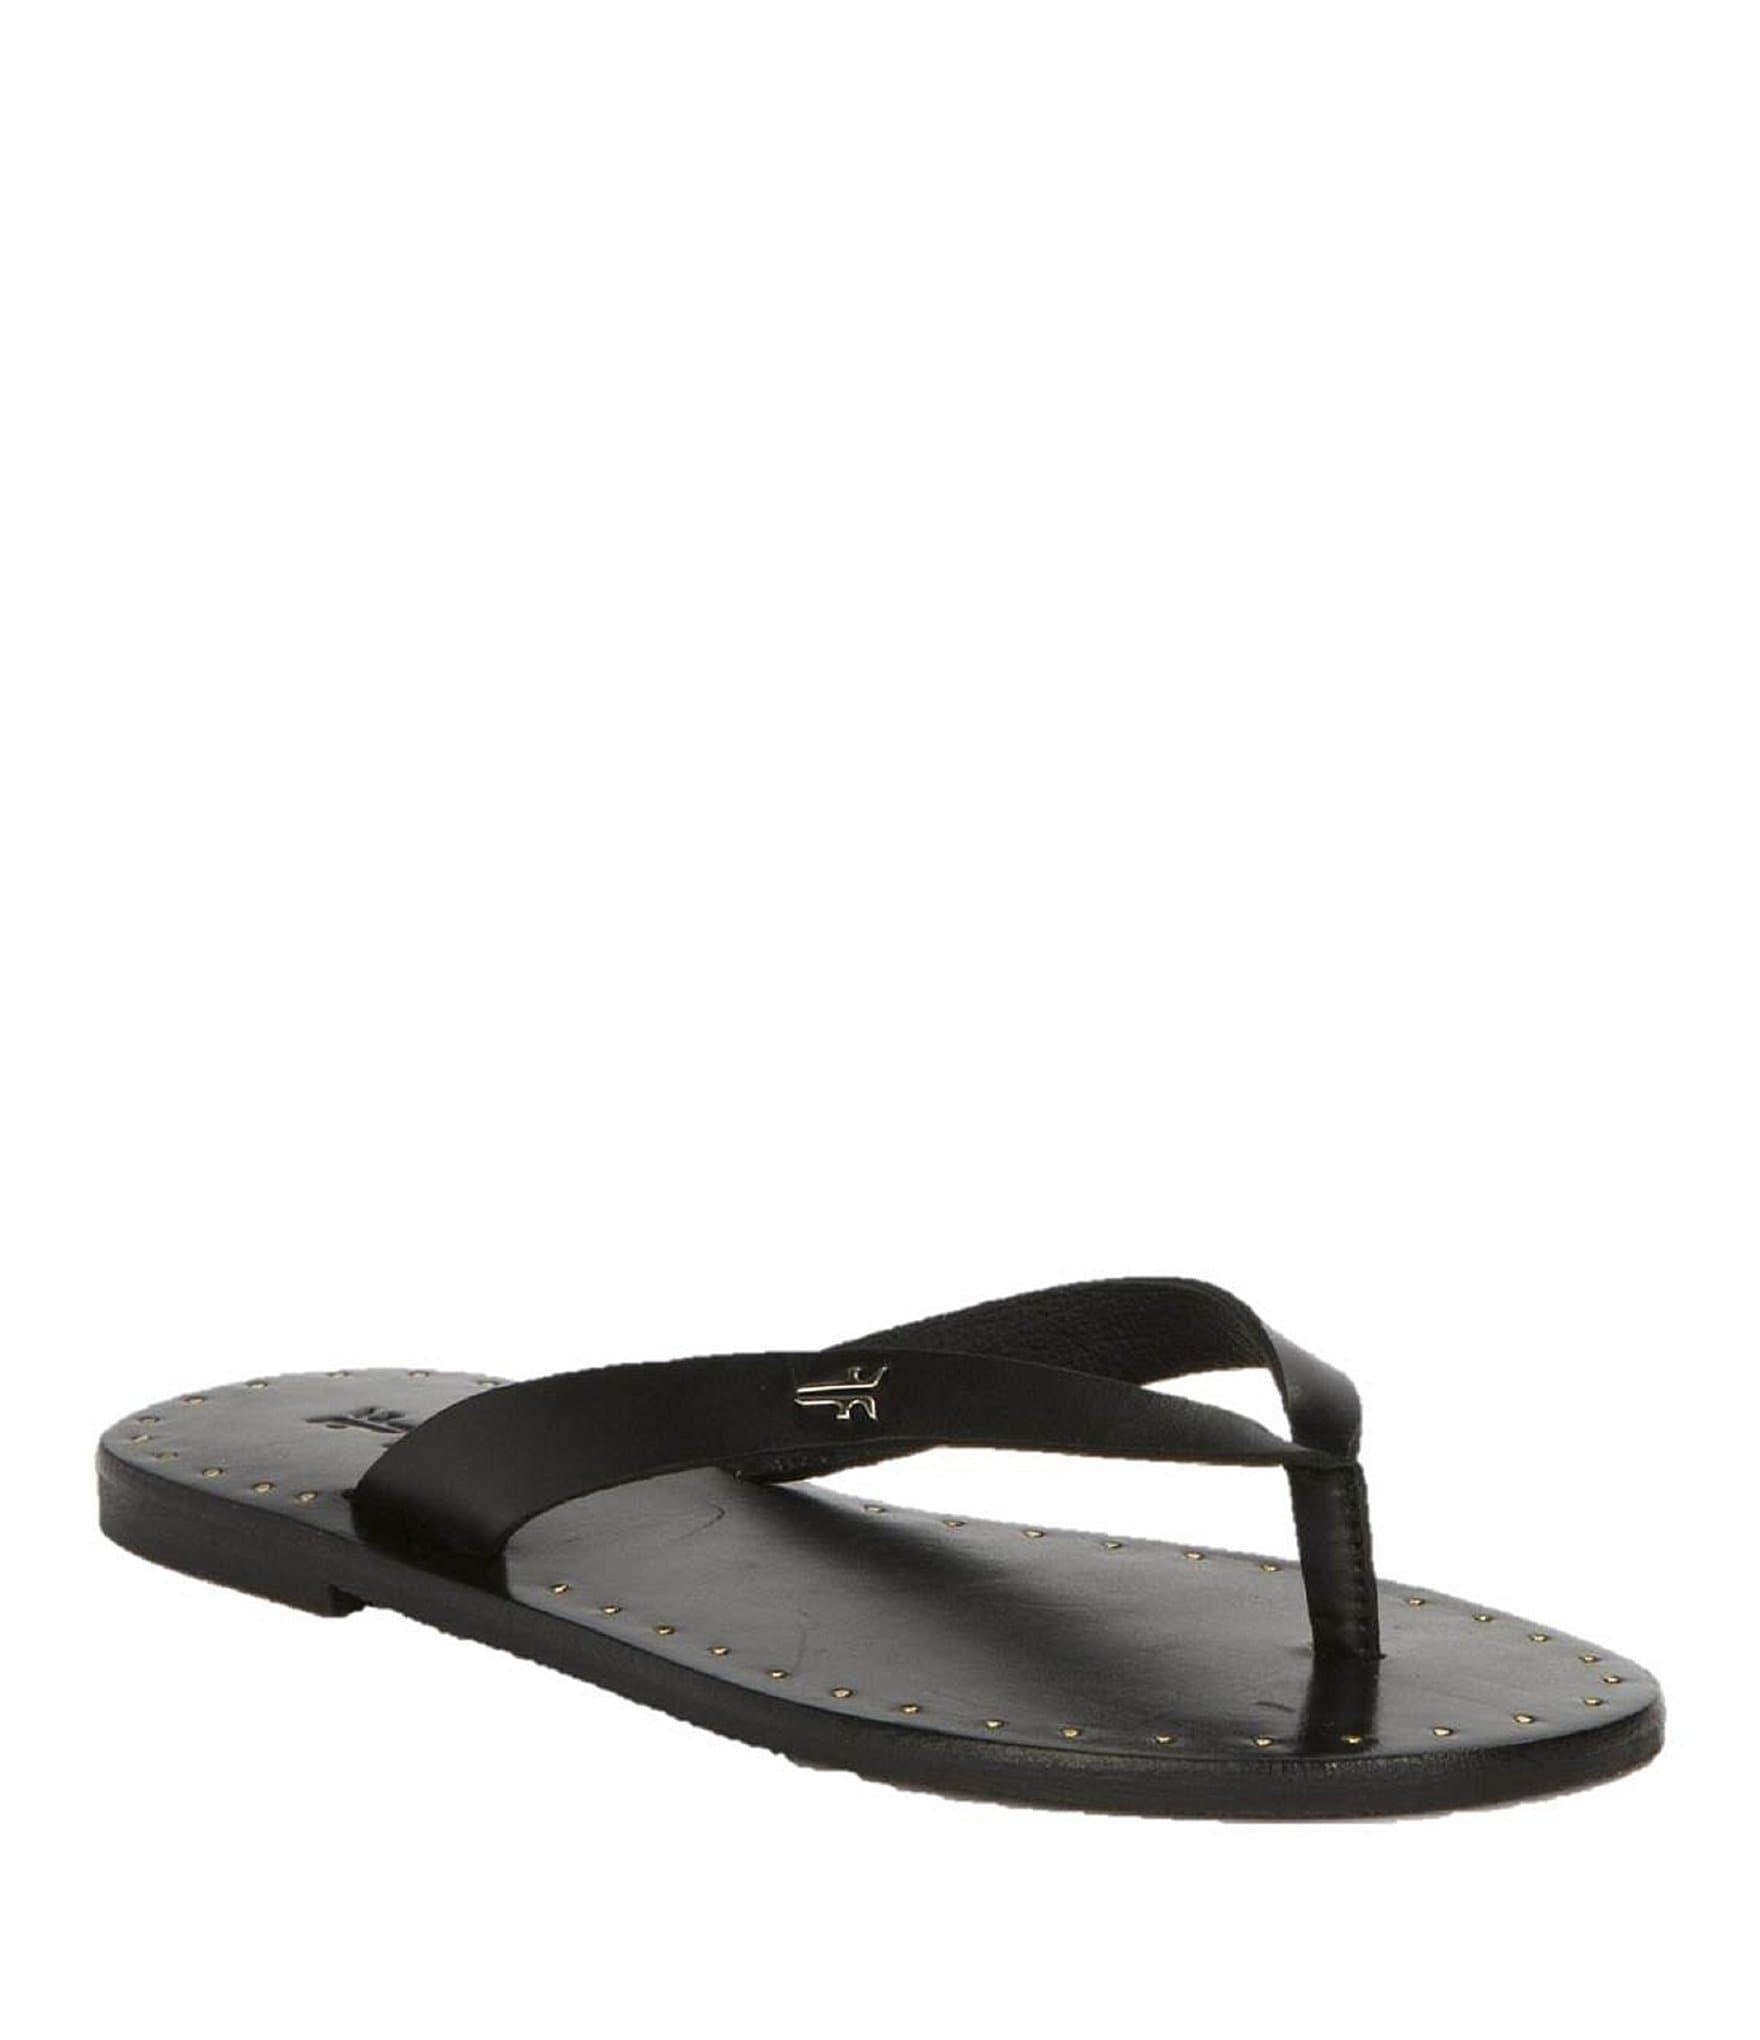 Frye Company Blair Harness Sandal (Women's) DUAyqIiPqq